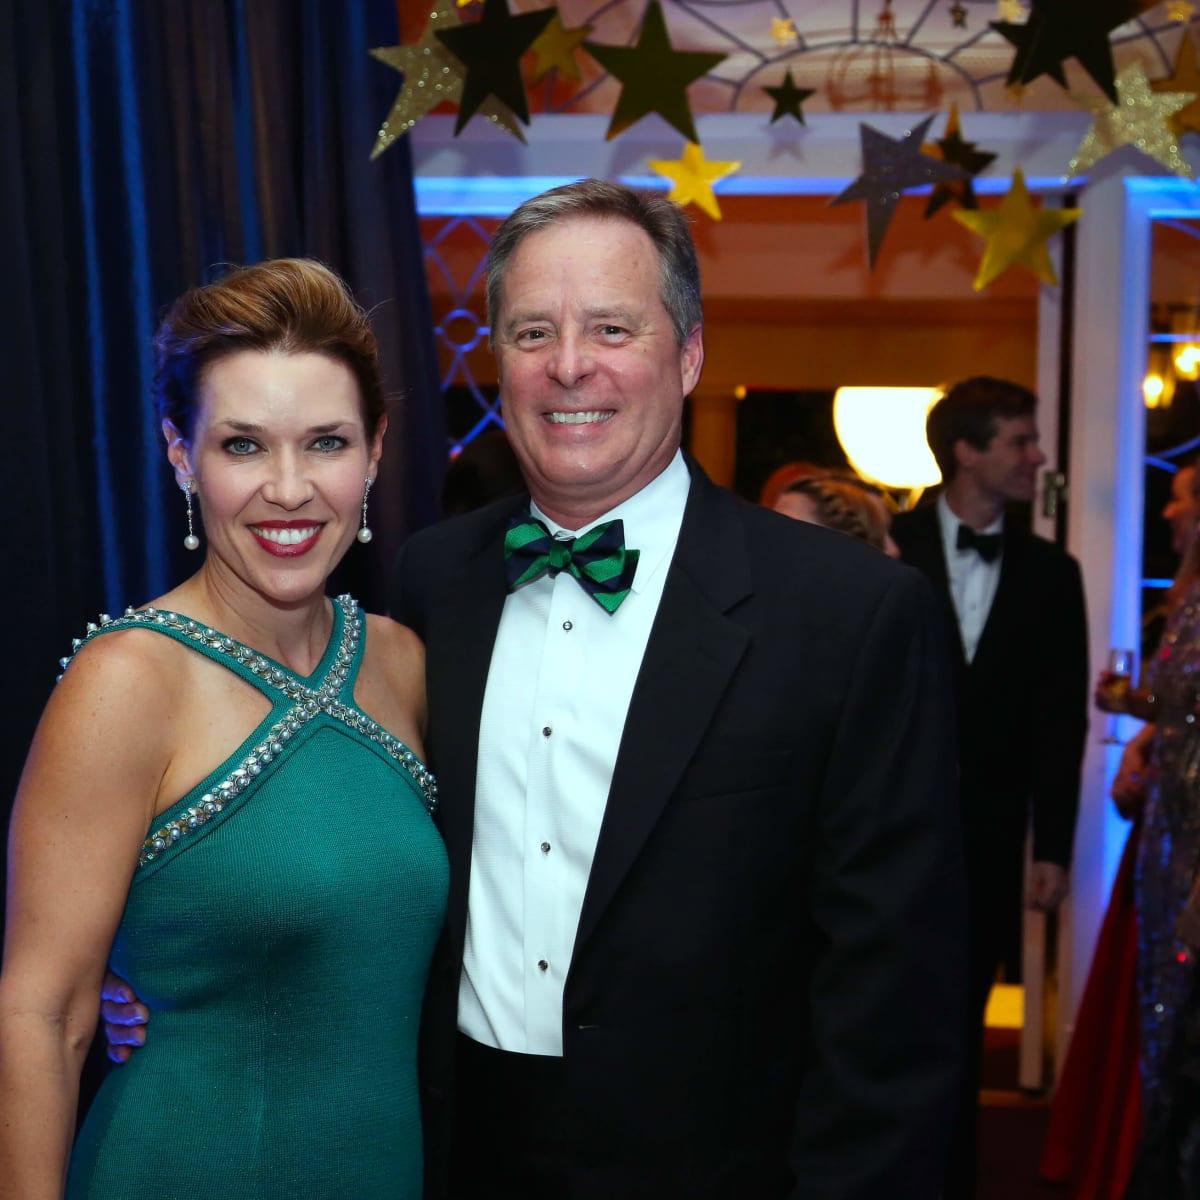 Houston, Junior League of Houston Charity Ball, Feb 2017, Marian Hilbert, Tim Hilbert